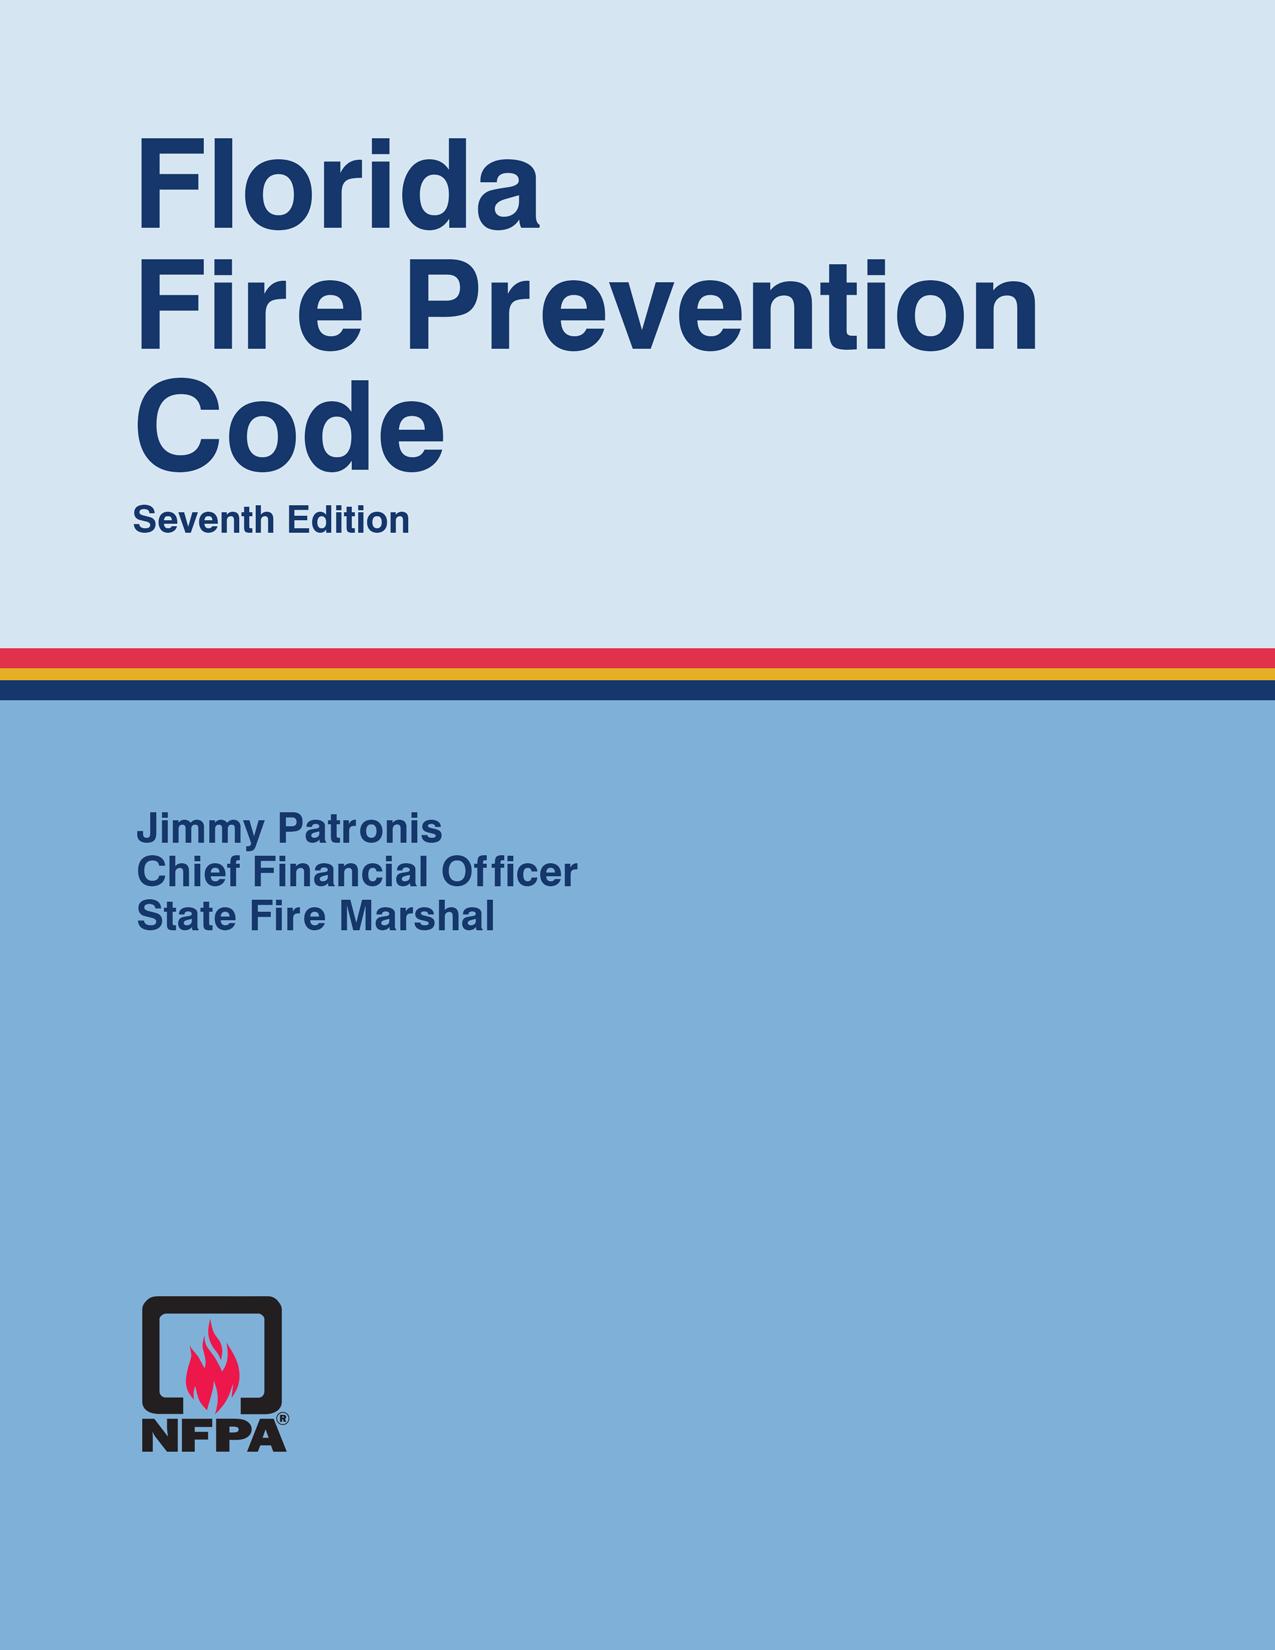 Florida Fire Prevention Code Seventh Edition